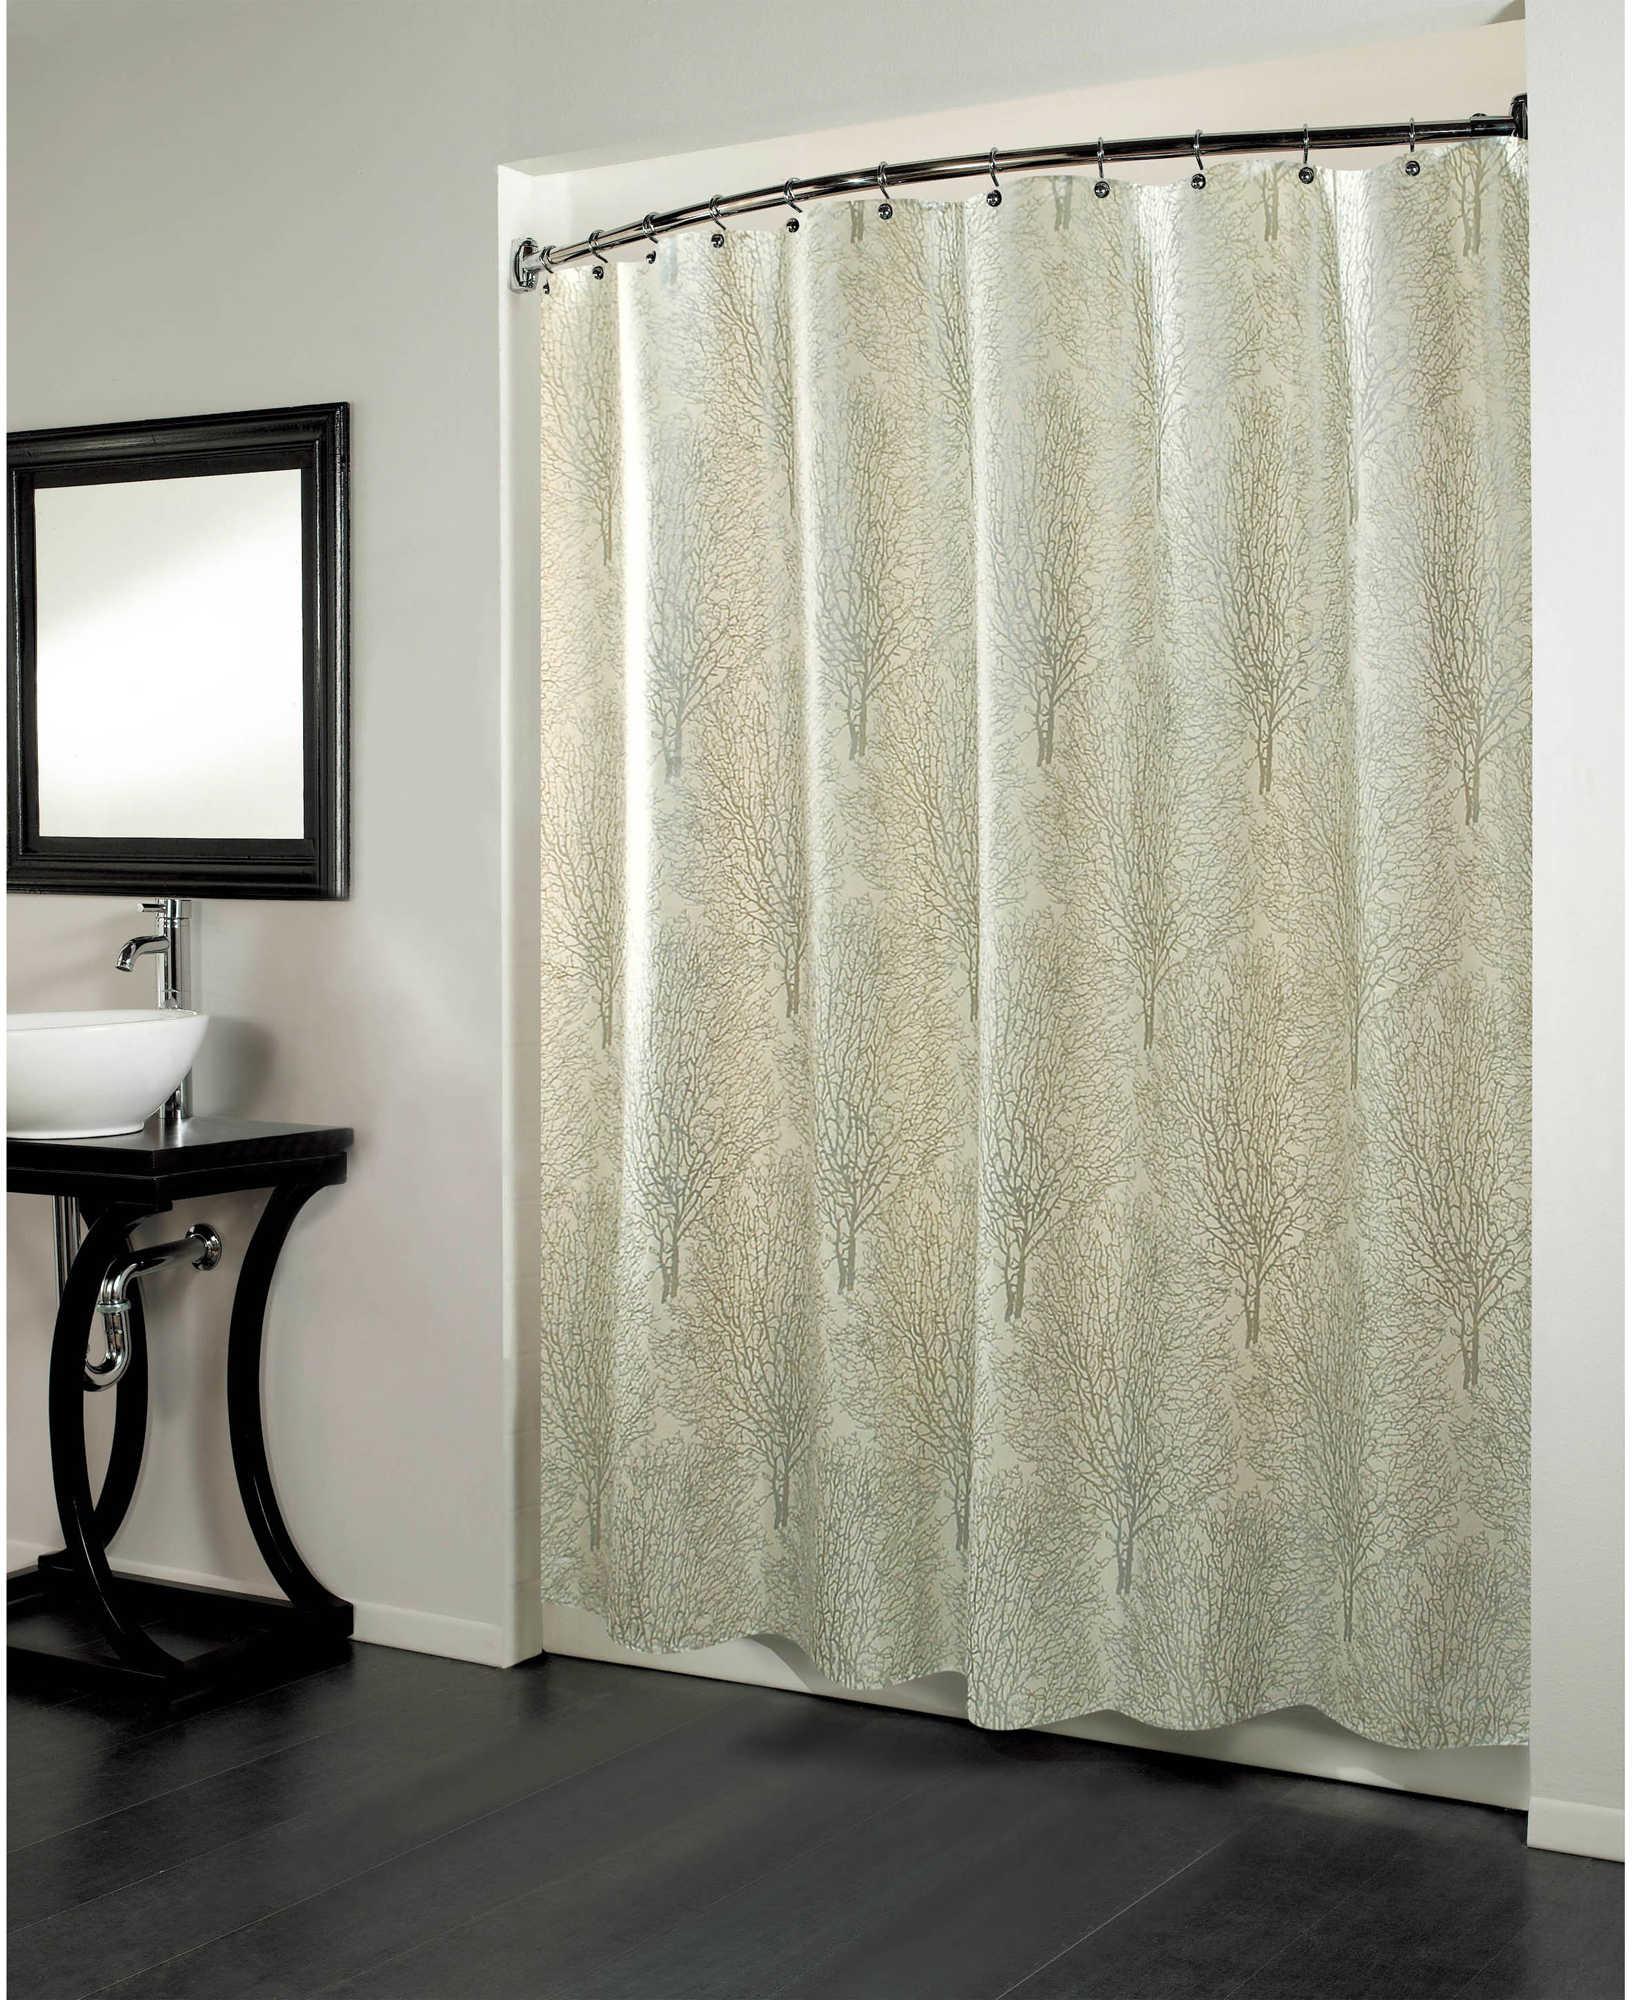 Forest Fabric Metallic Print Shower Curtain - BedBathandBeyond.com